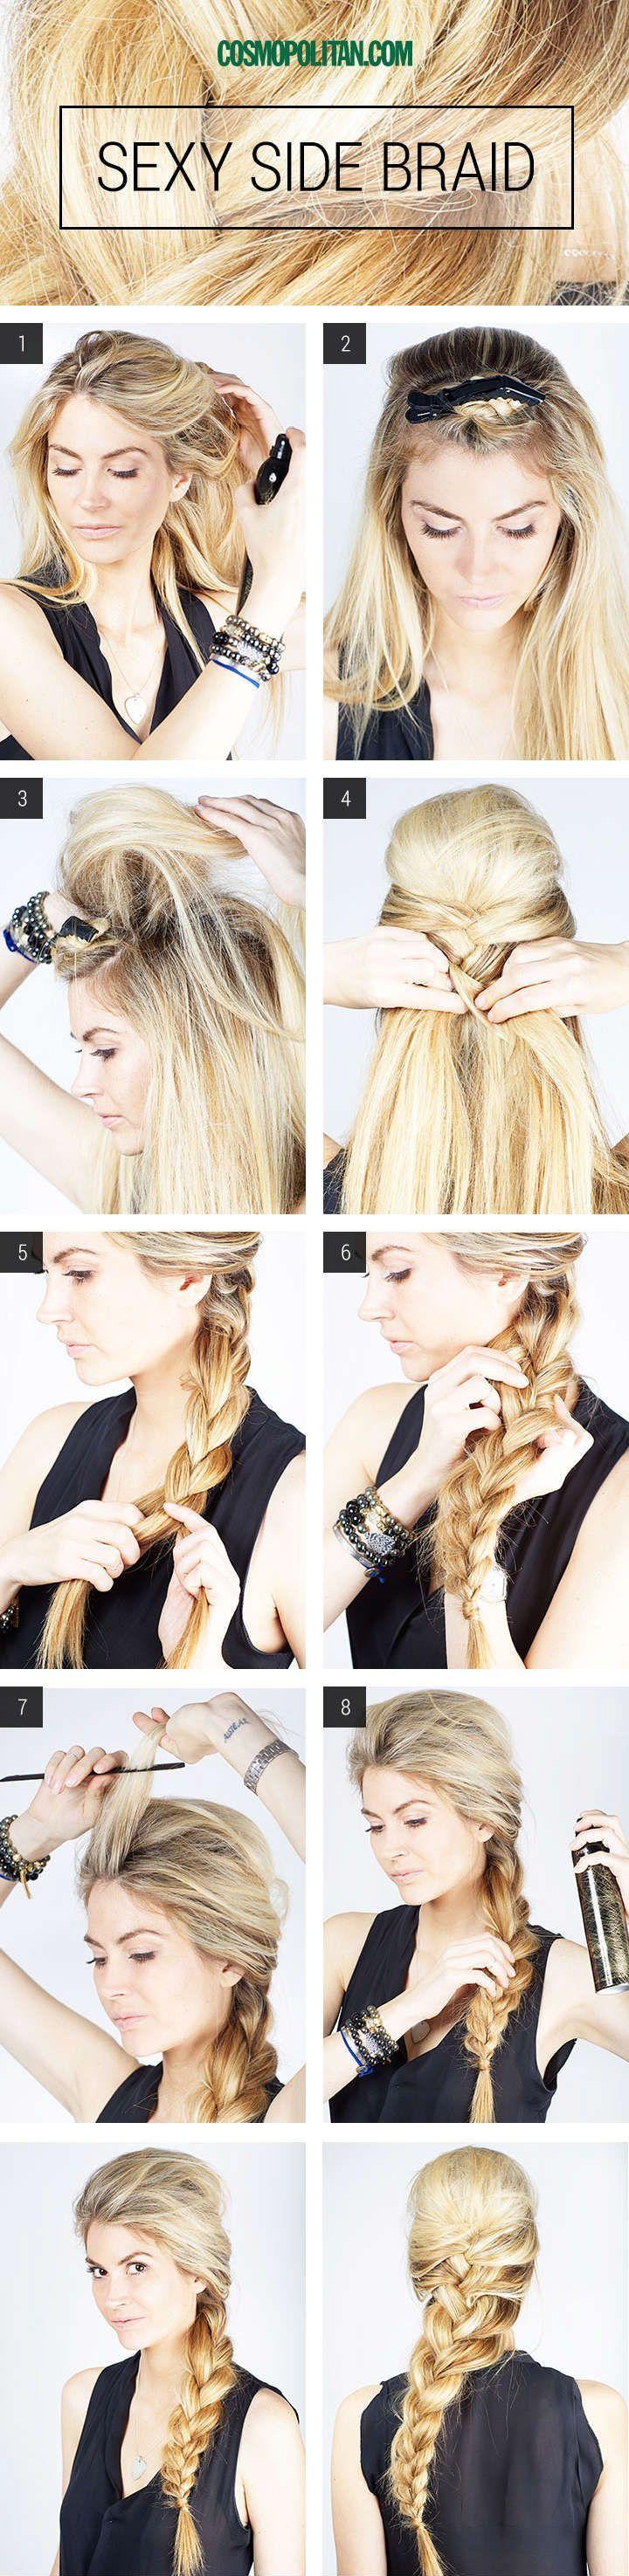 #CheveuxLongBlond